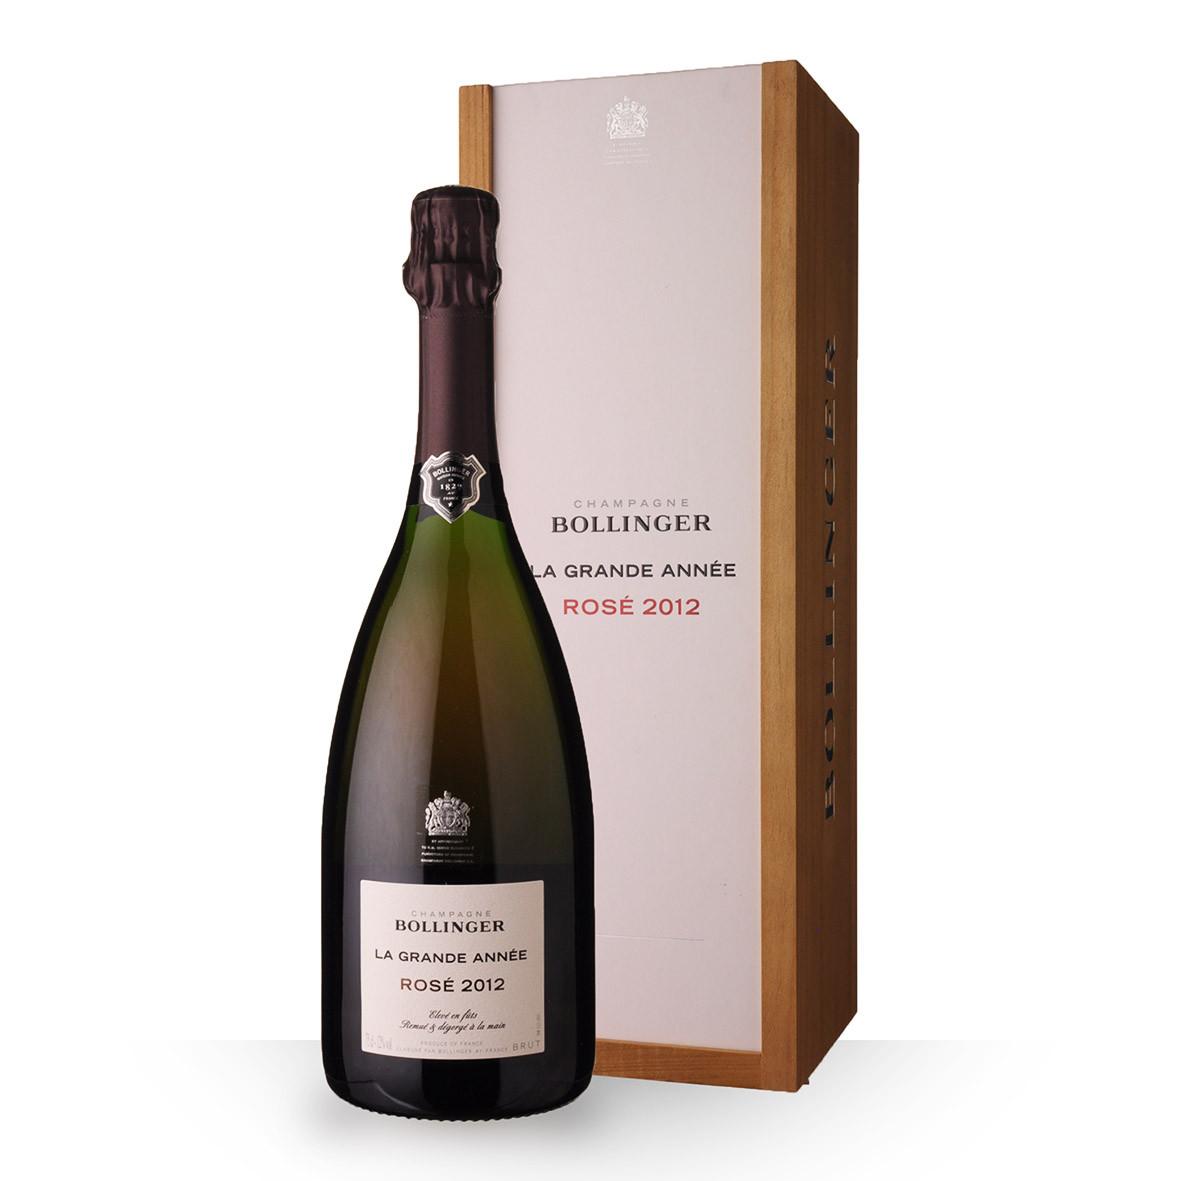 Champagne Bollinger La Grande Année 2012 Brut Rosé 75cl Coffret www.odyssee-vins.com